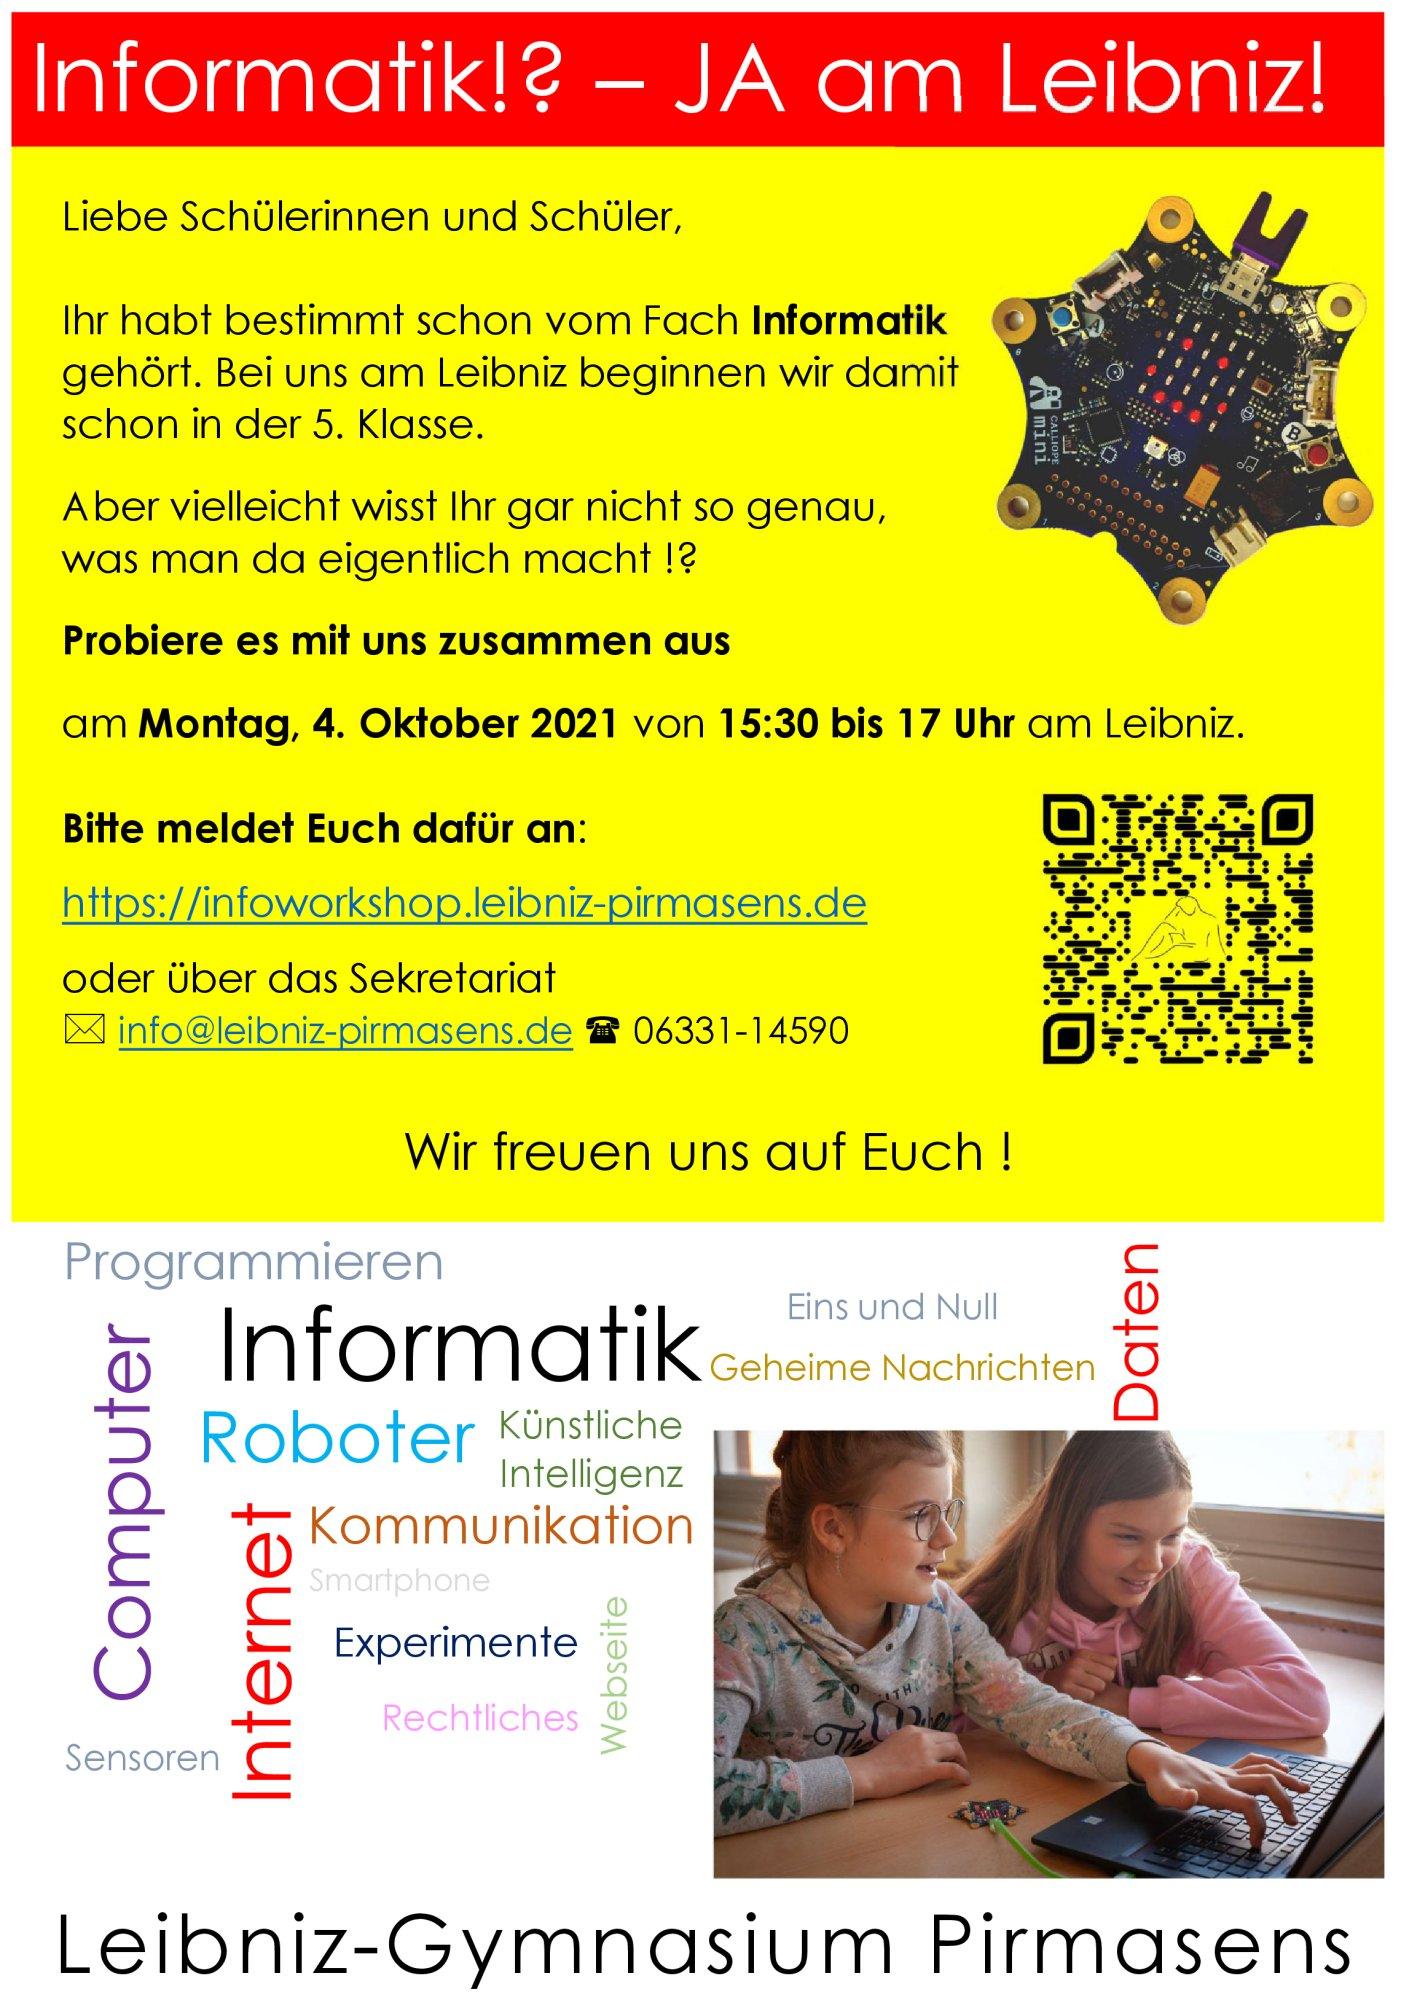 Informatik-Workshop 4.10.21